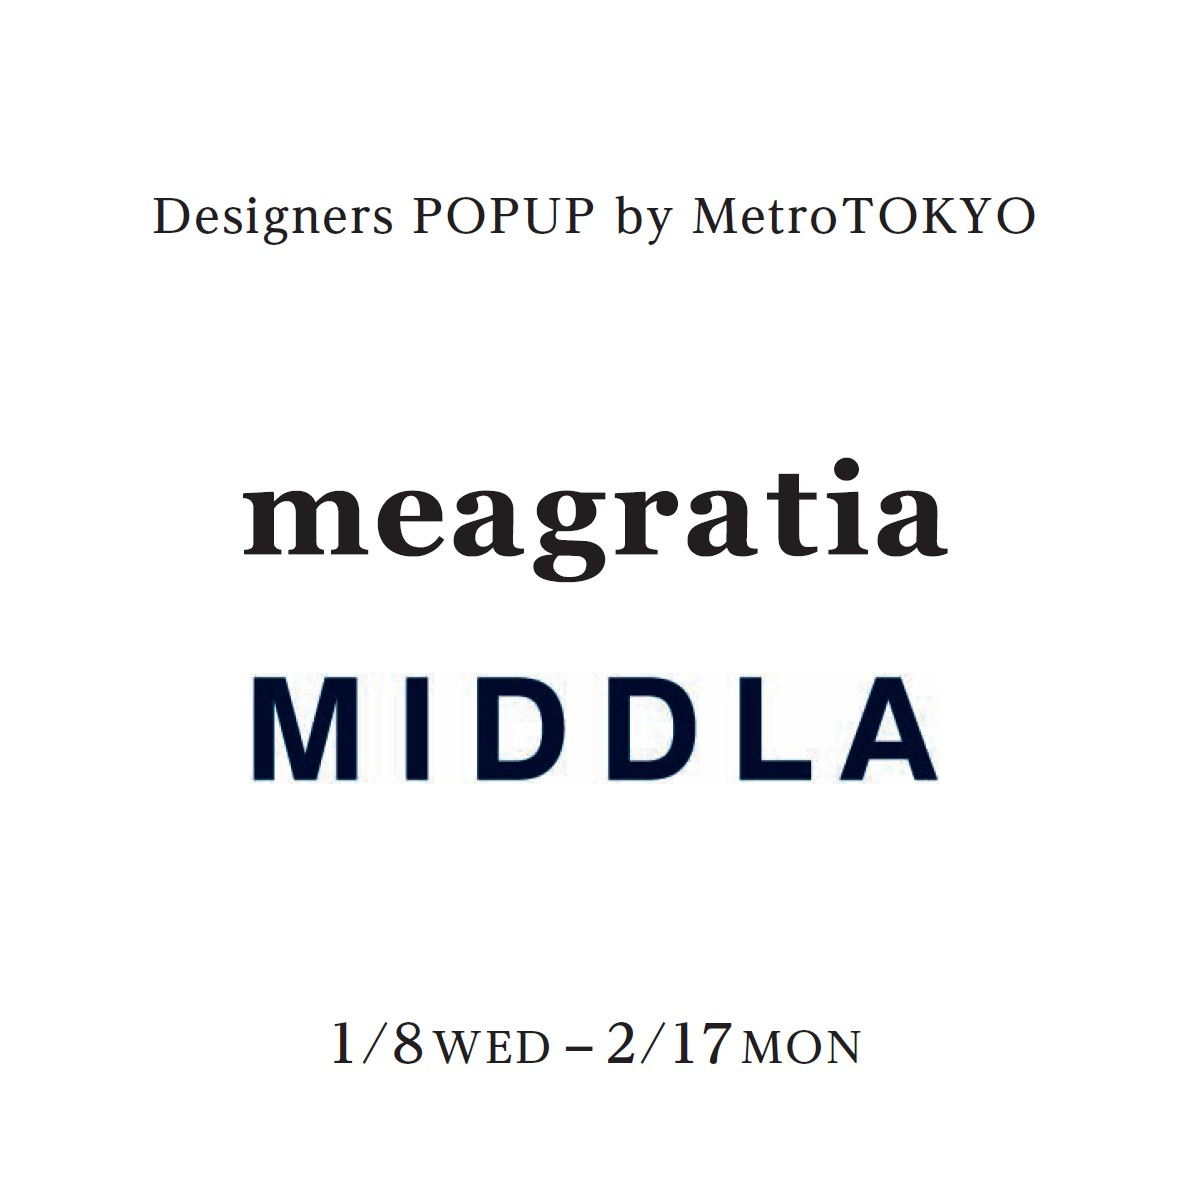 meagratia、MIDDLA-Designers POPUP by MetroTOKYO-